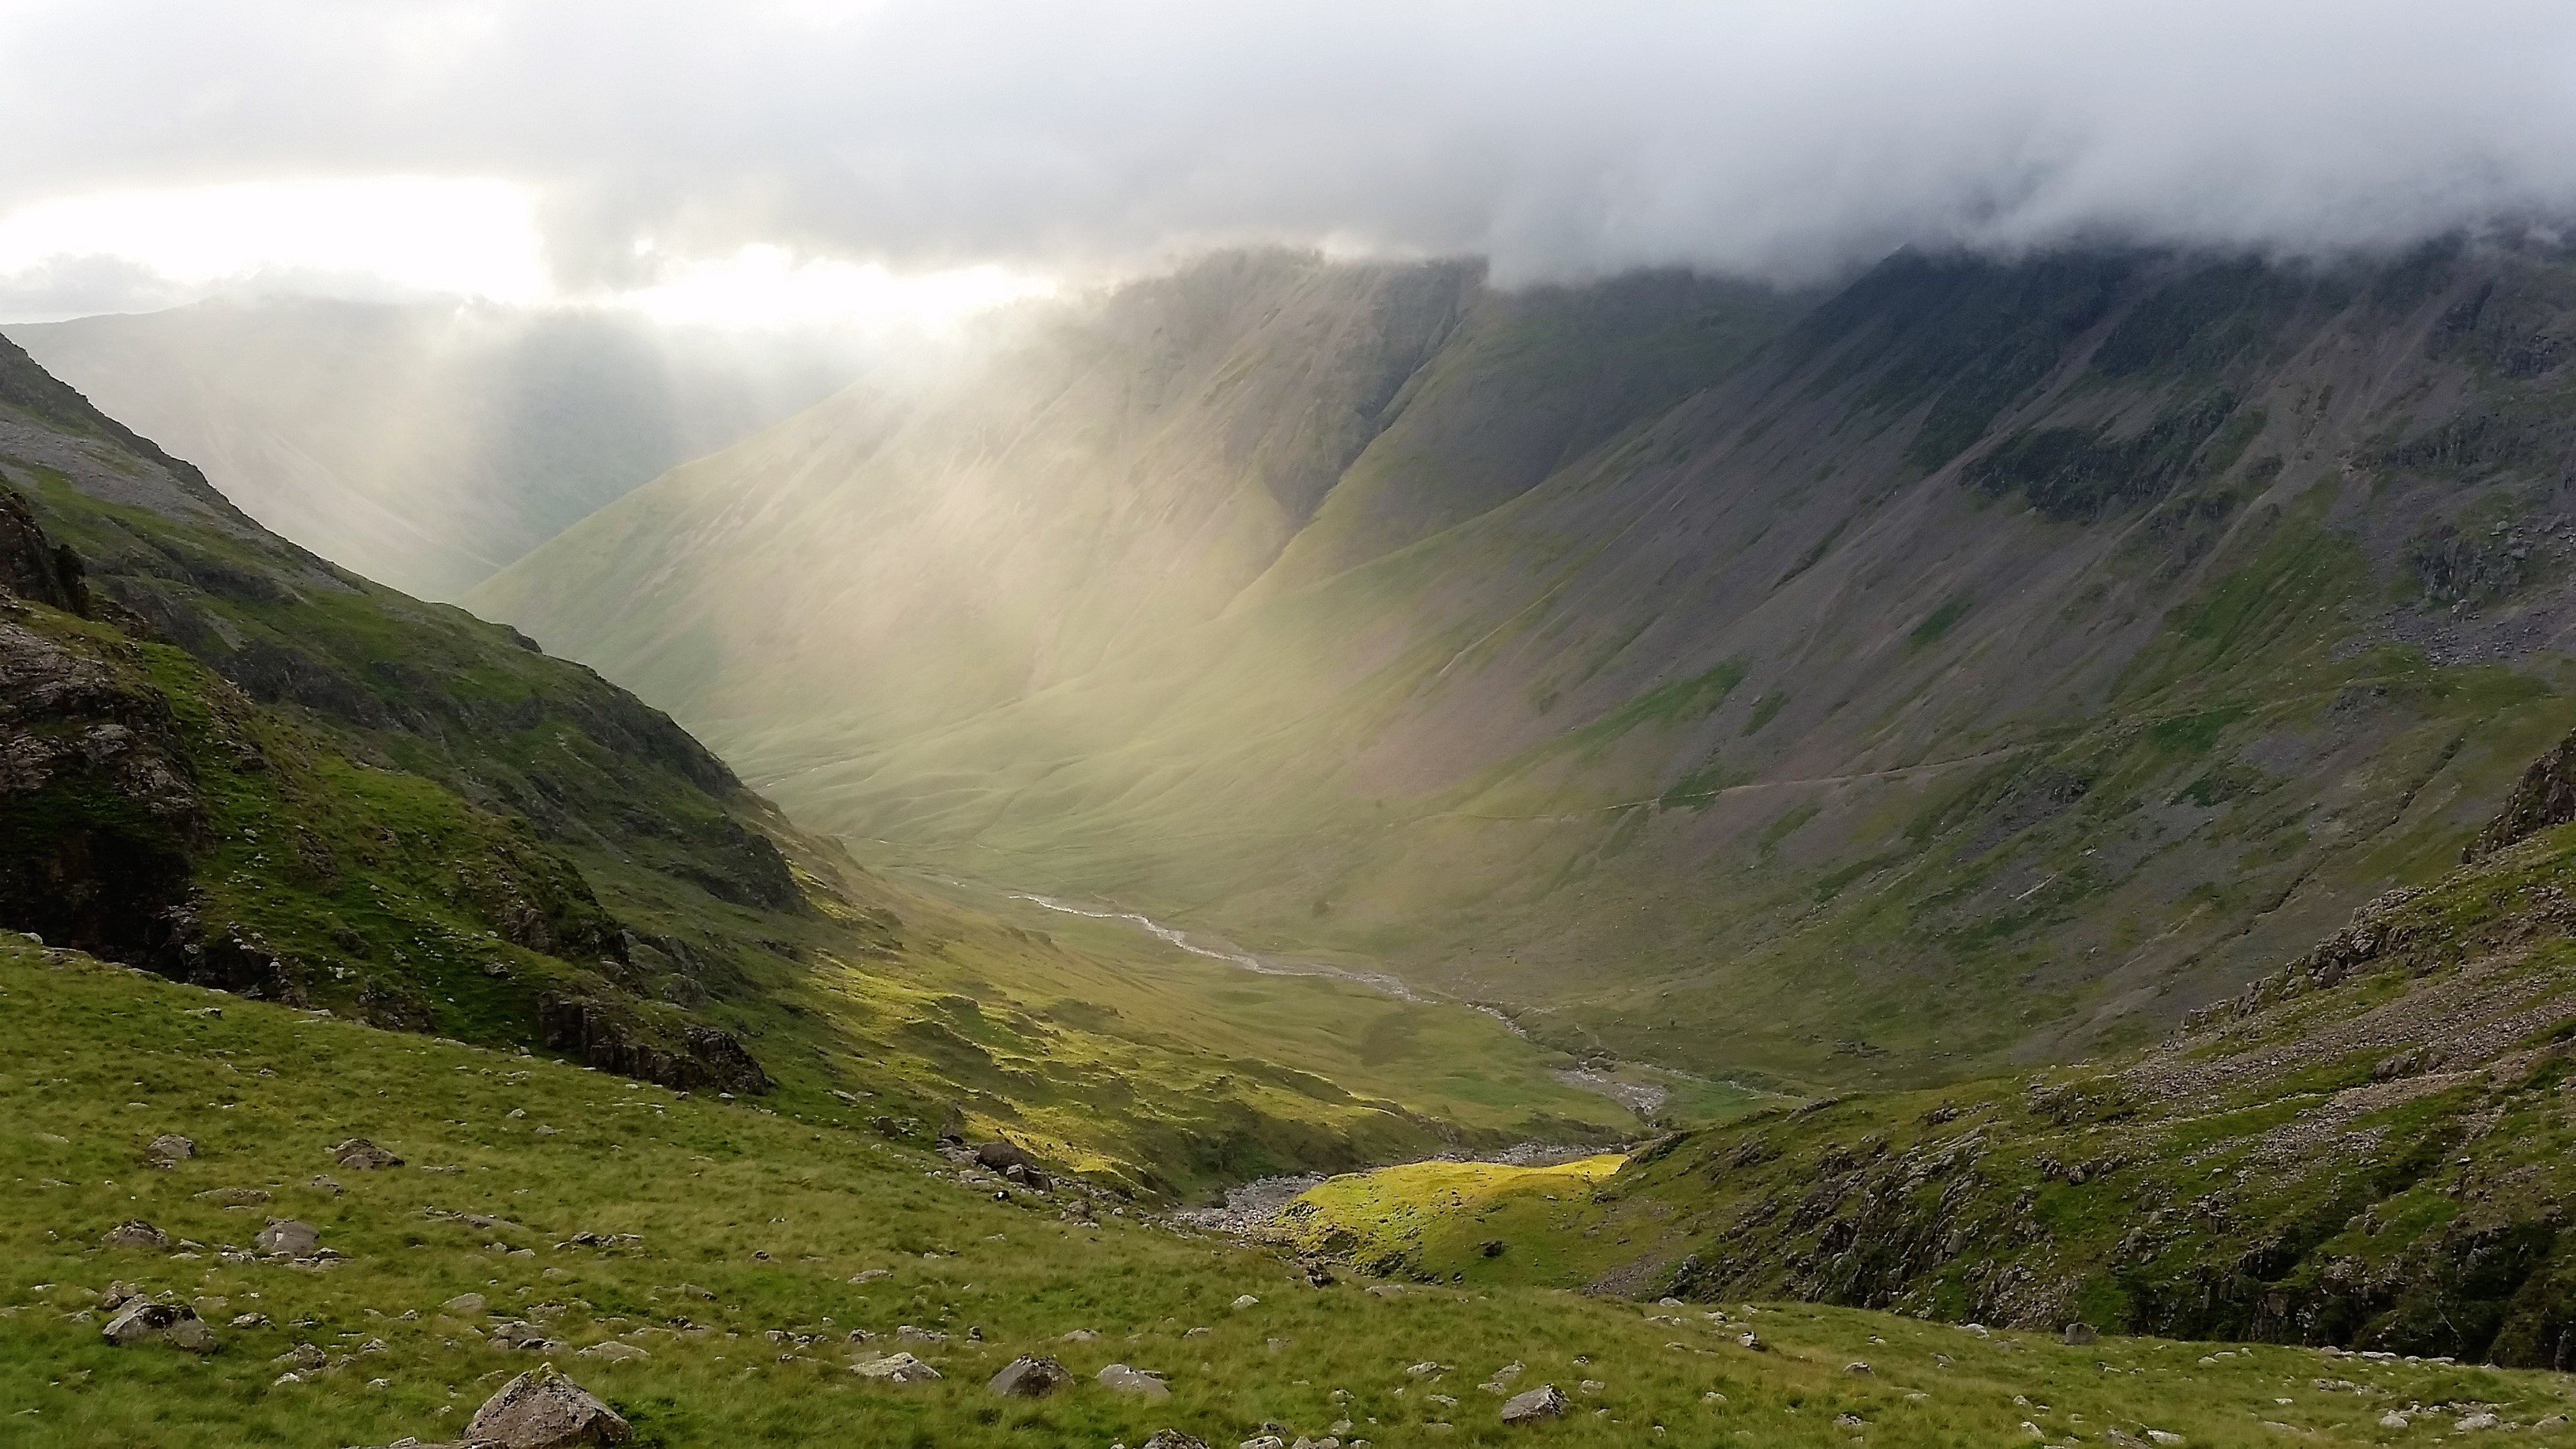 Lake District 10 Peak Challenge